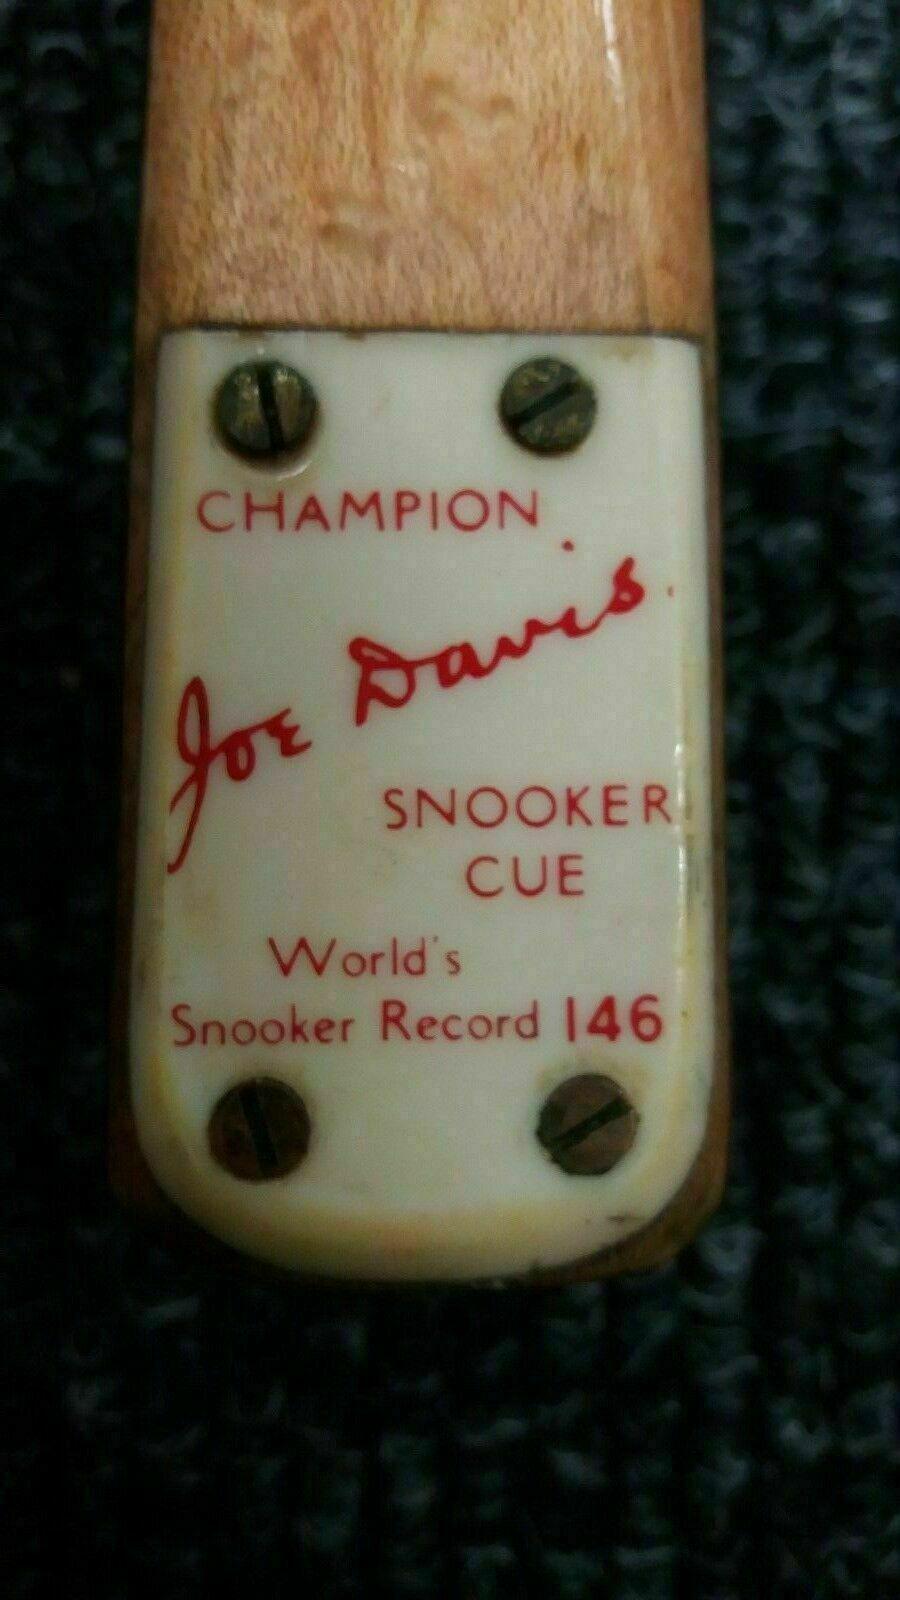 JOE DAVIS (146) CHAMPION SNOOKER CUE - 400